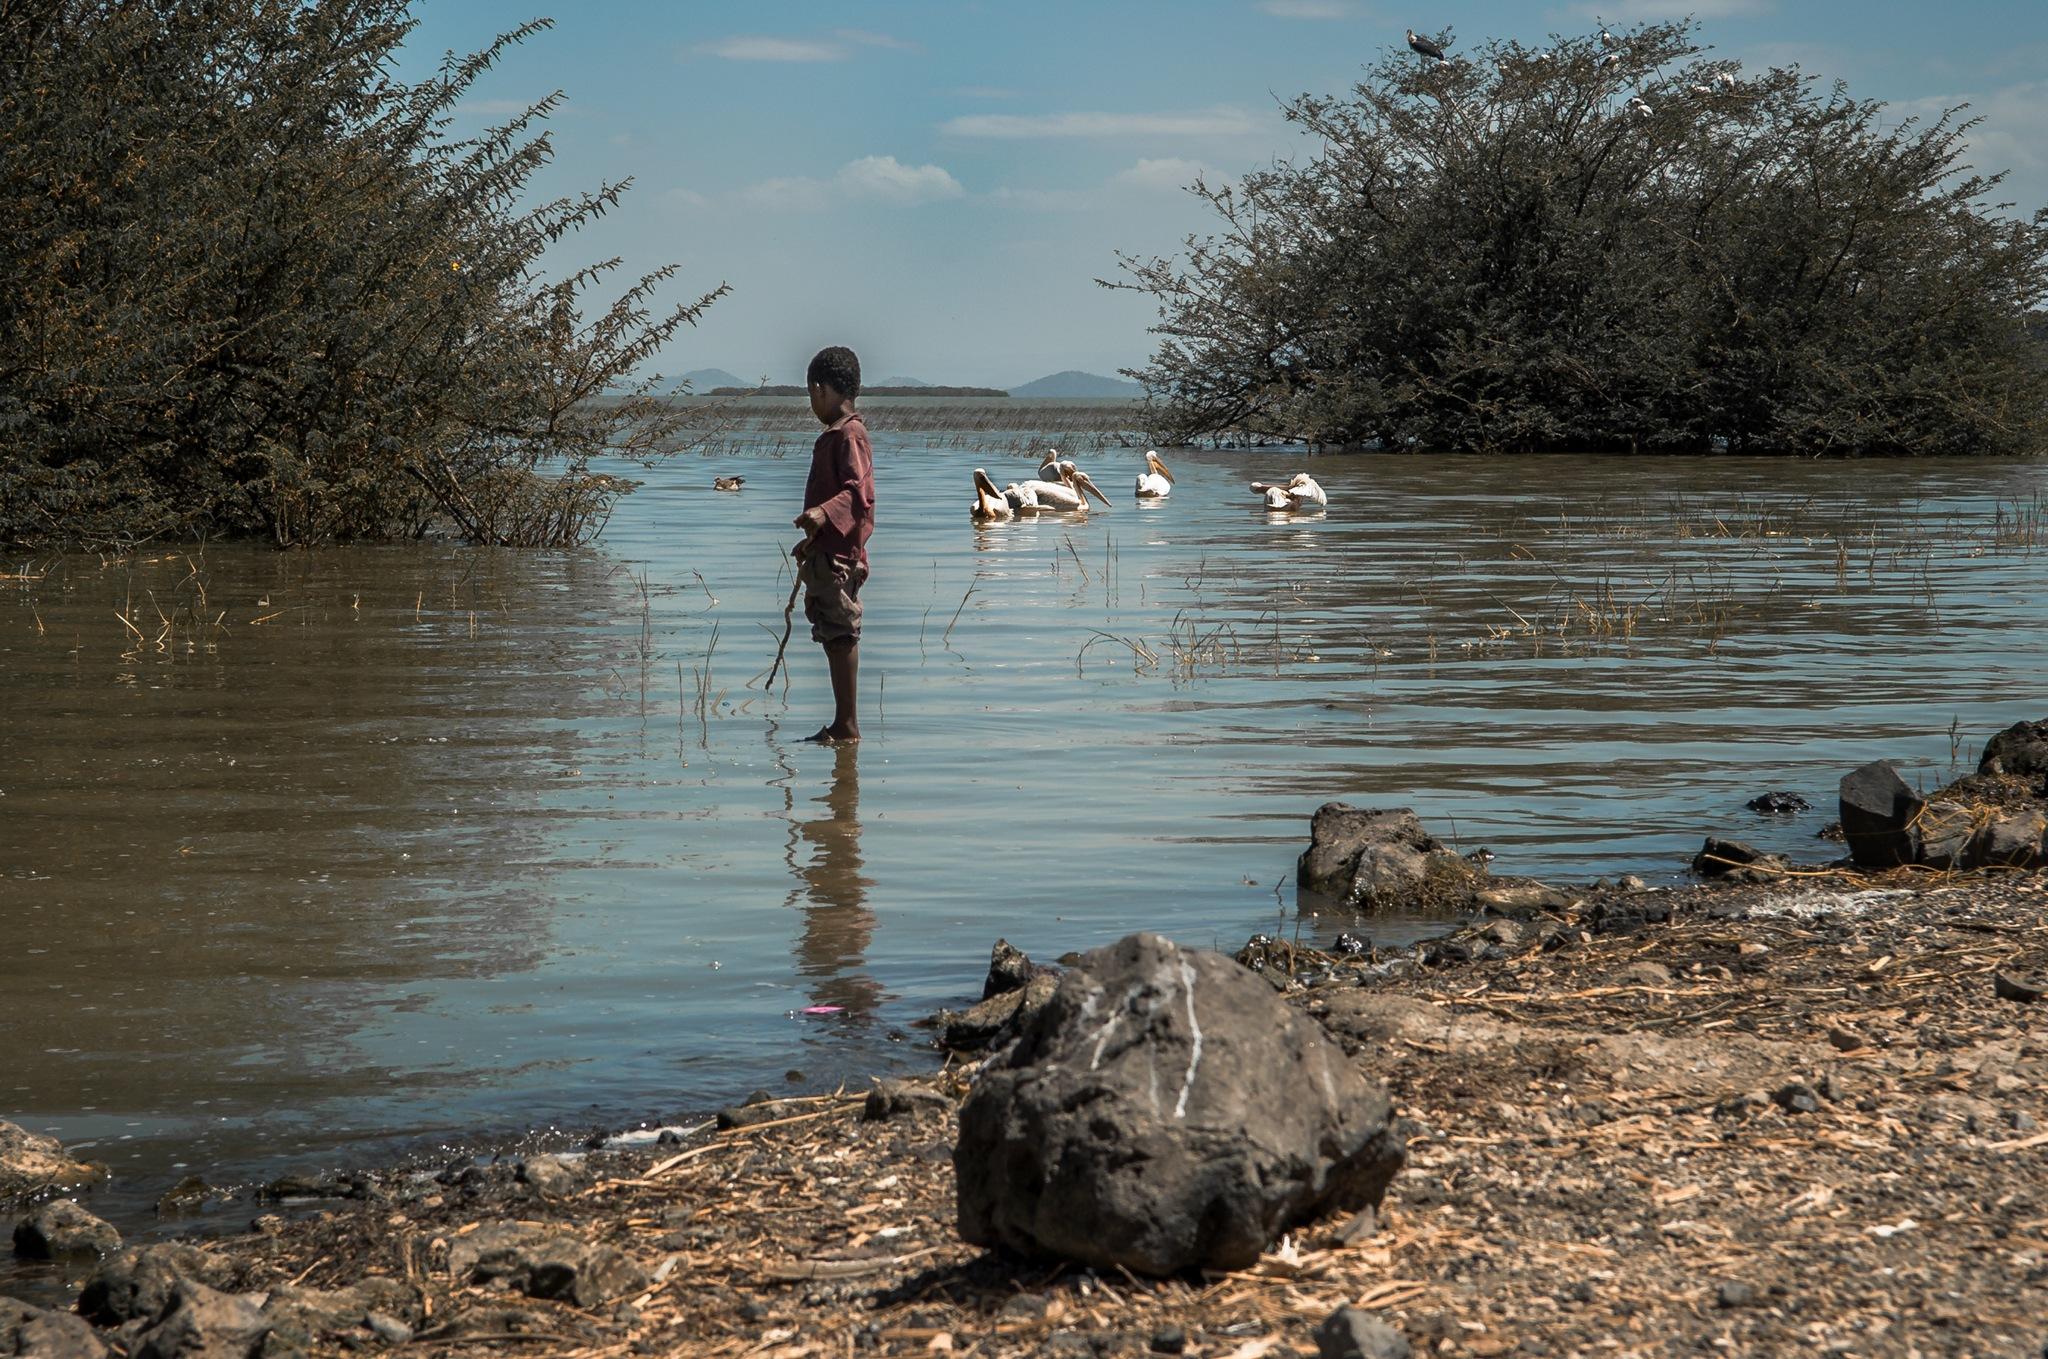 """Boy fishing in Chamo Lake"" by Juan Mas-Bagá"